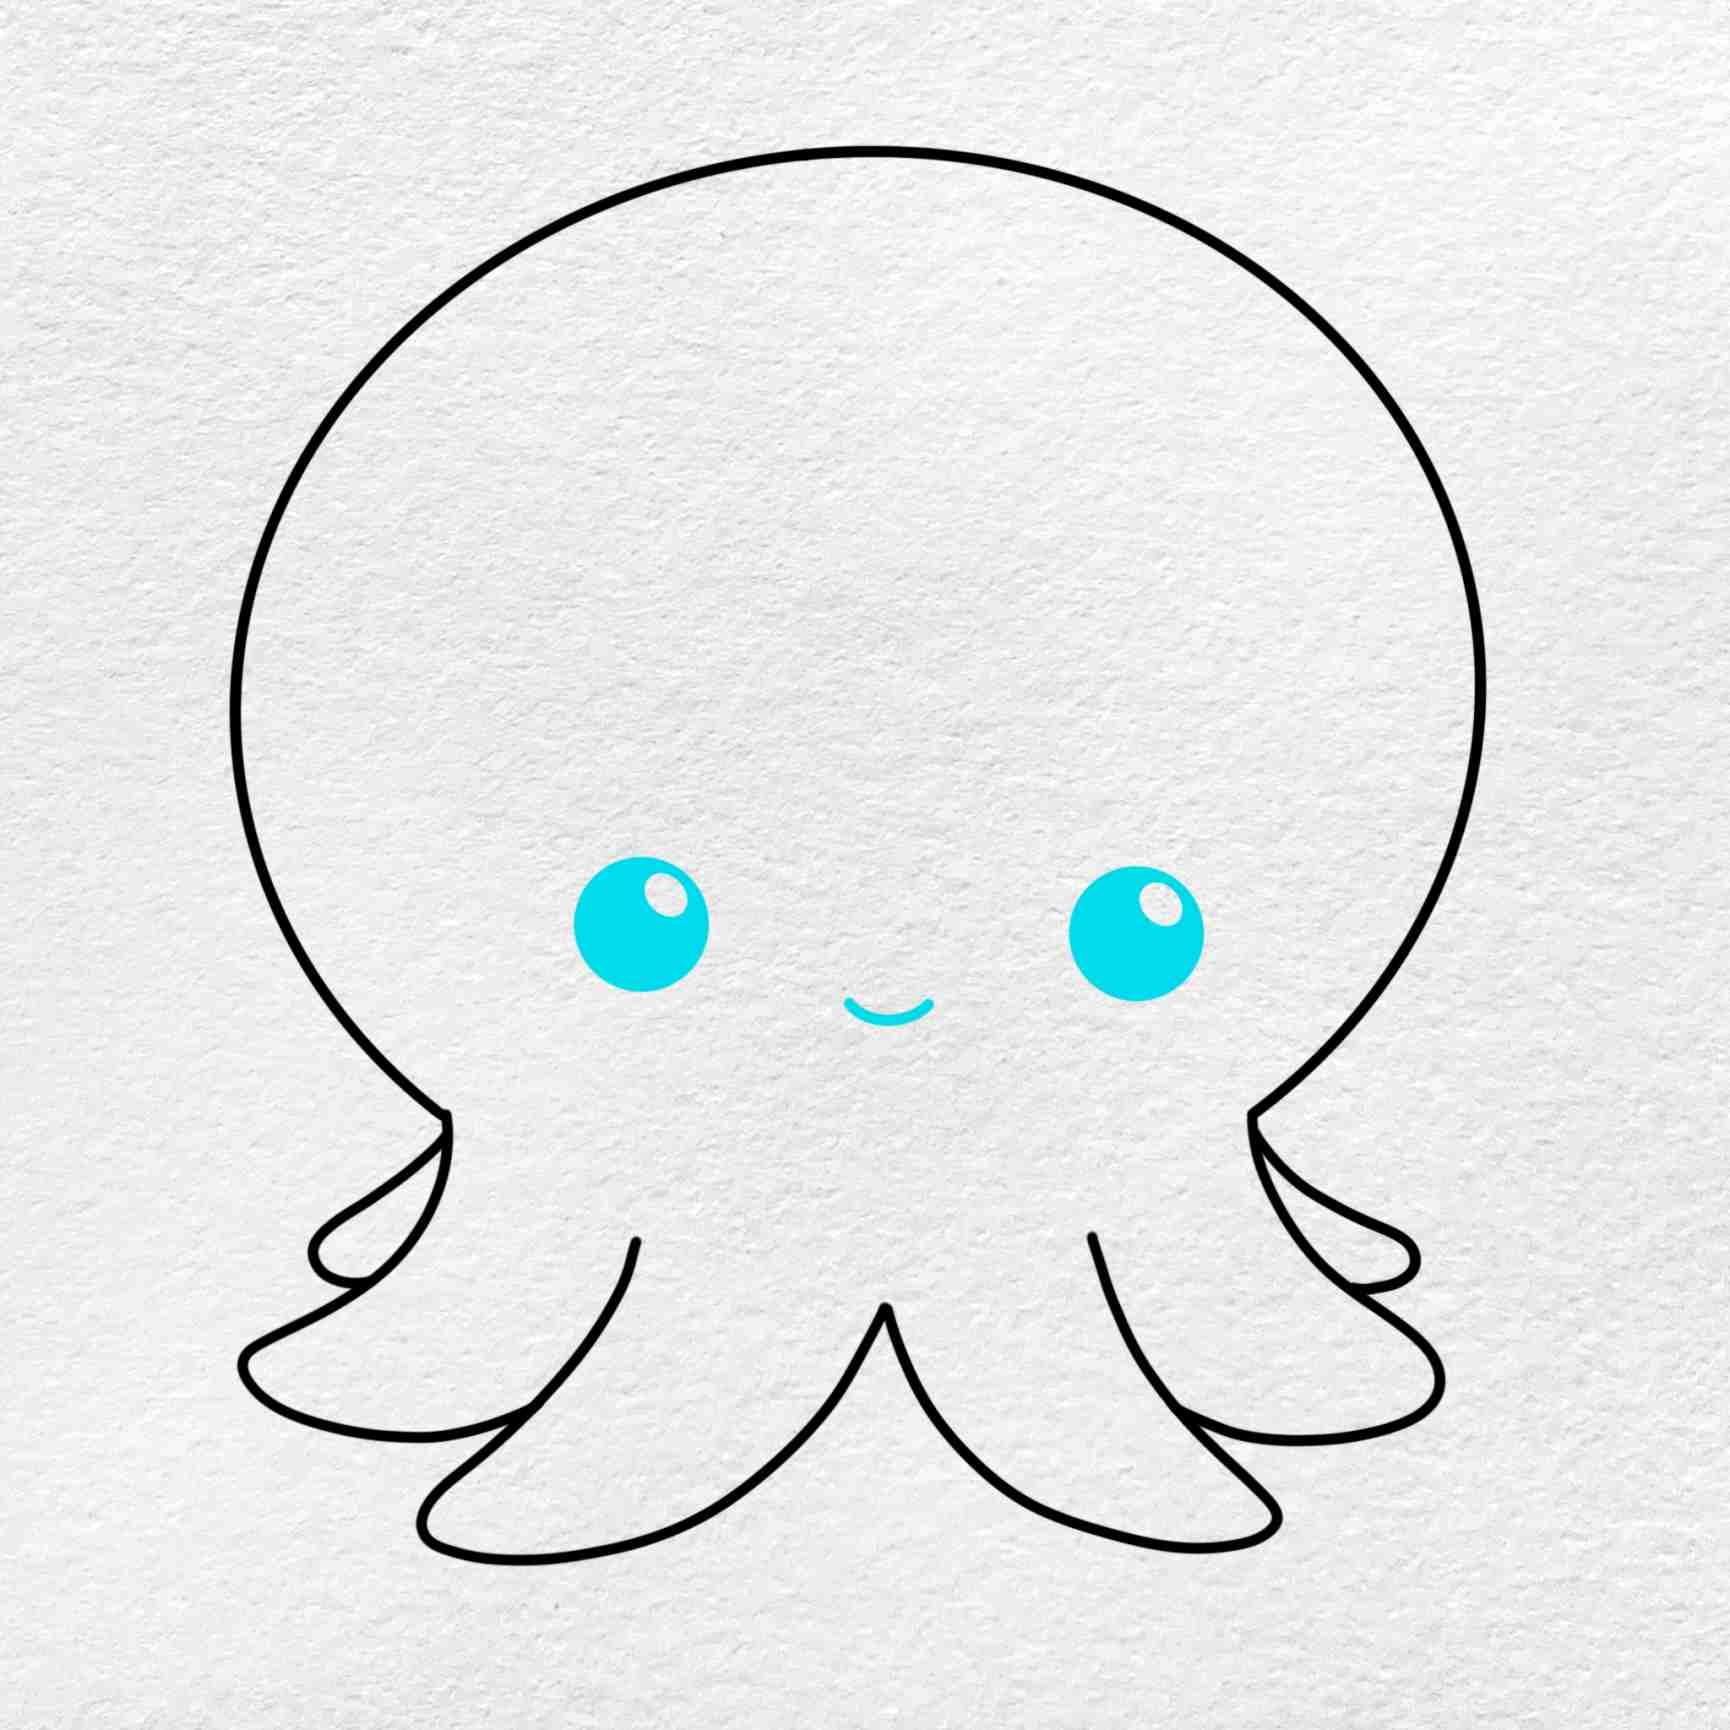 Octopus Cartoon Drawing: Step 5